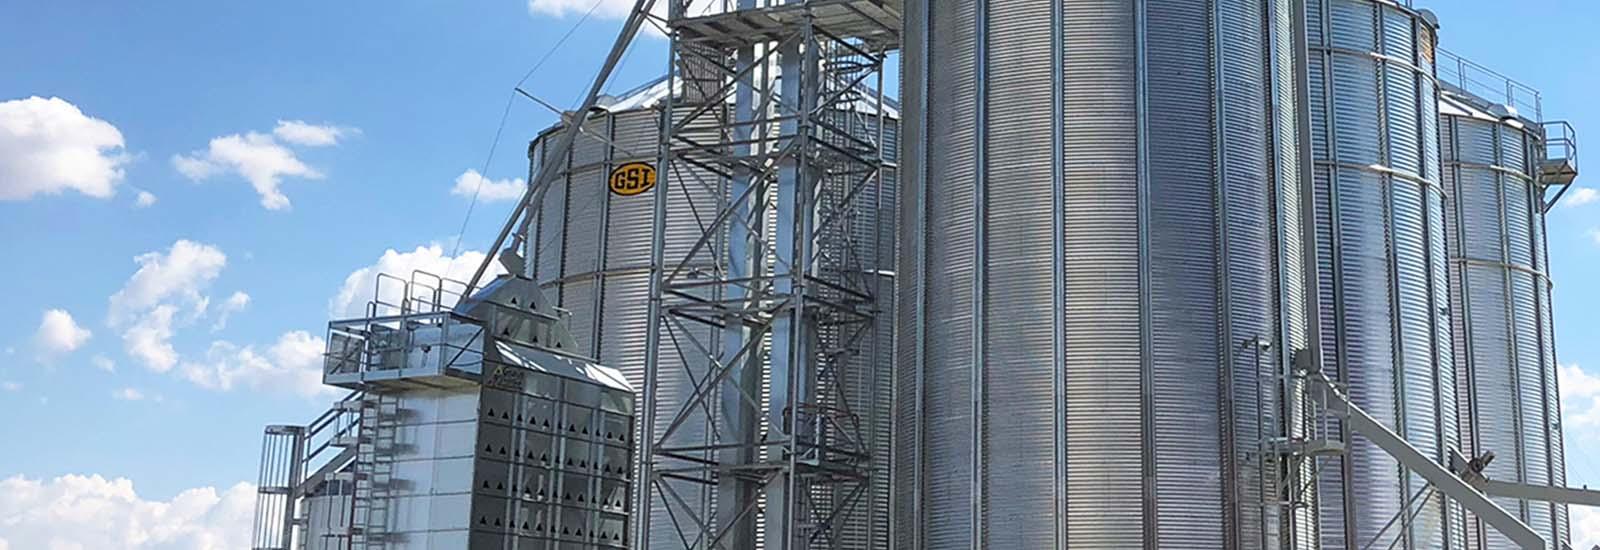 Grain Storage Opa's Organics